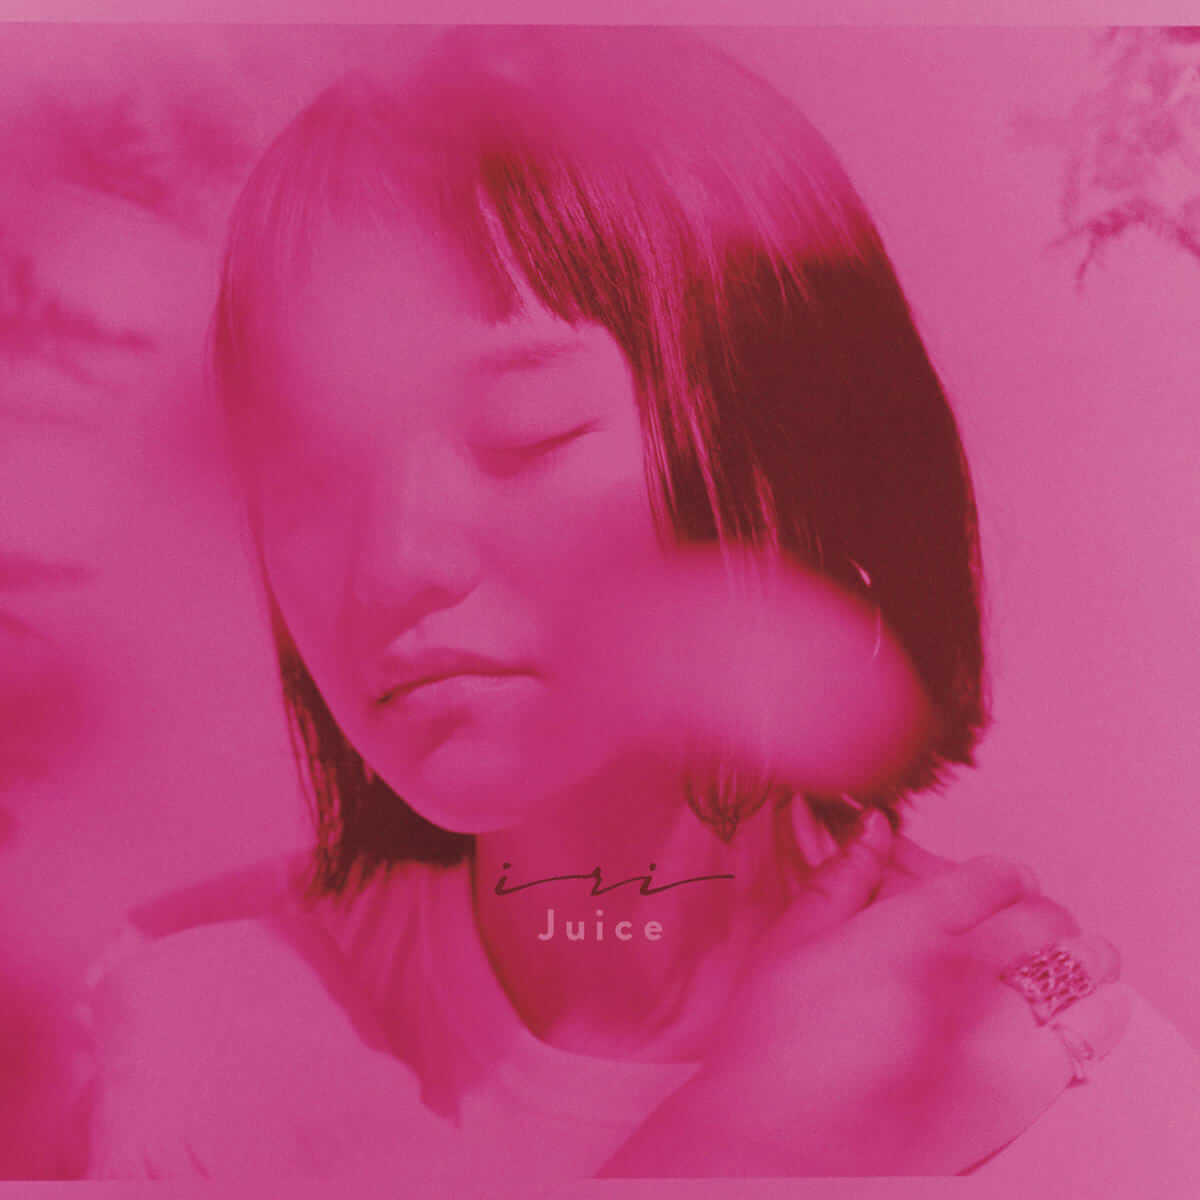 iri、初の海外ライブは大盛況!国際ファッション専門職大学TVCMソングとしてオンエアー中の新曲「Only One」リリース決定! music180622_iri_5-1200x1200